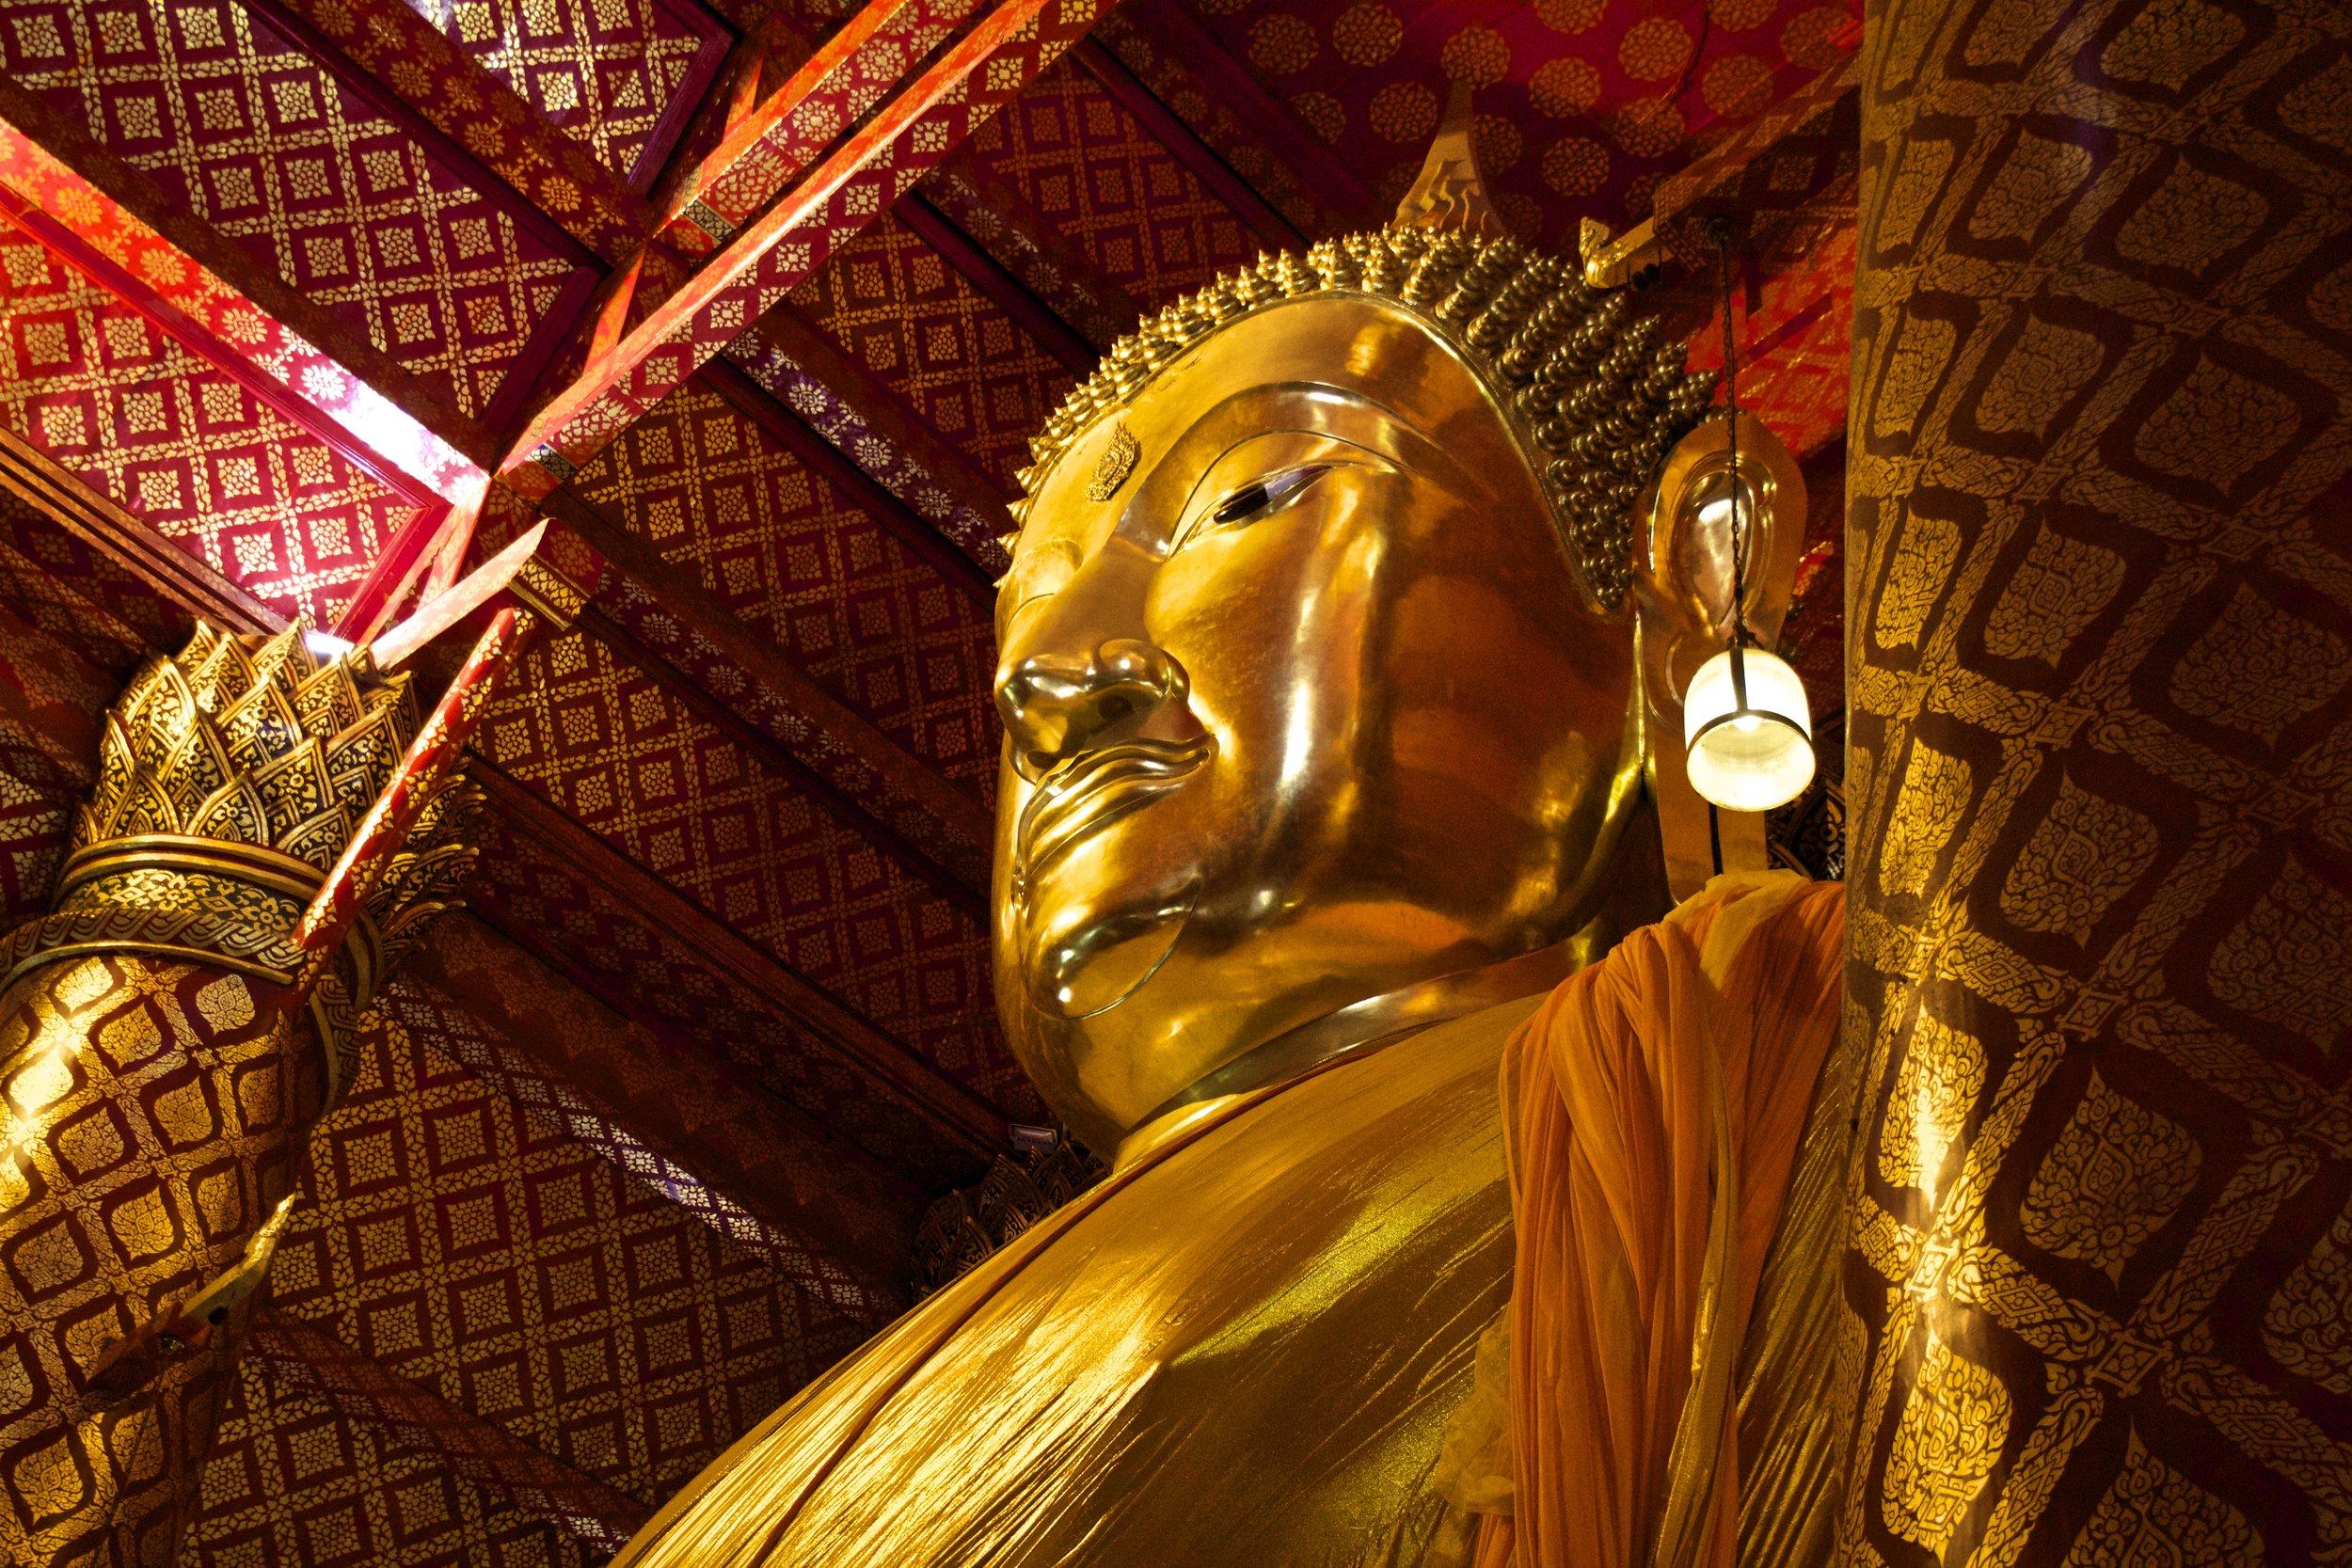 ayutthaya thailand buddhist temple 27.jpg